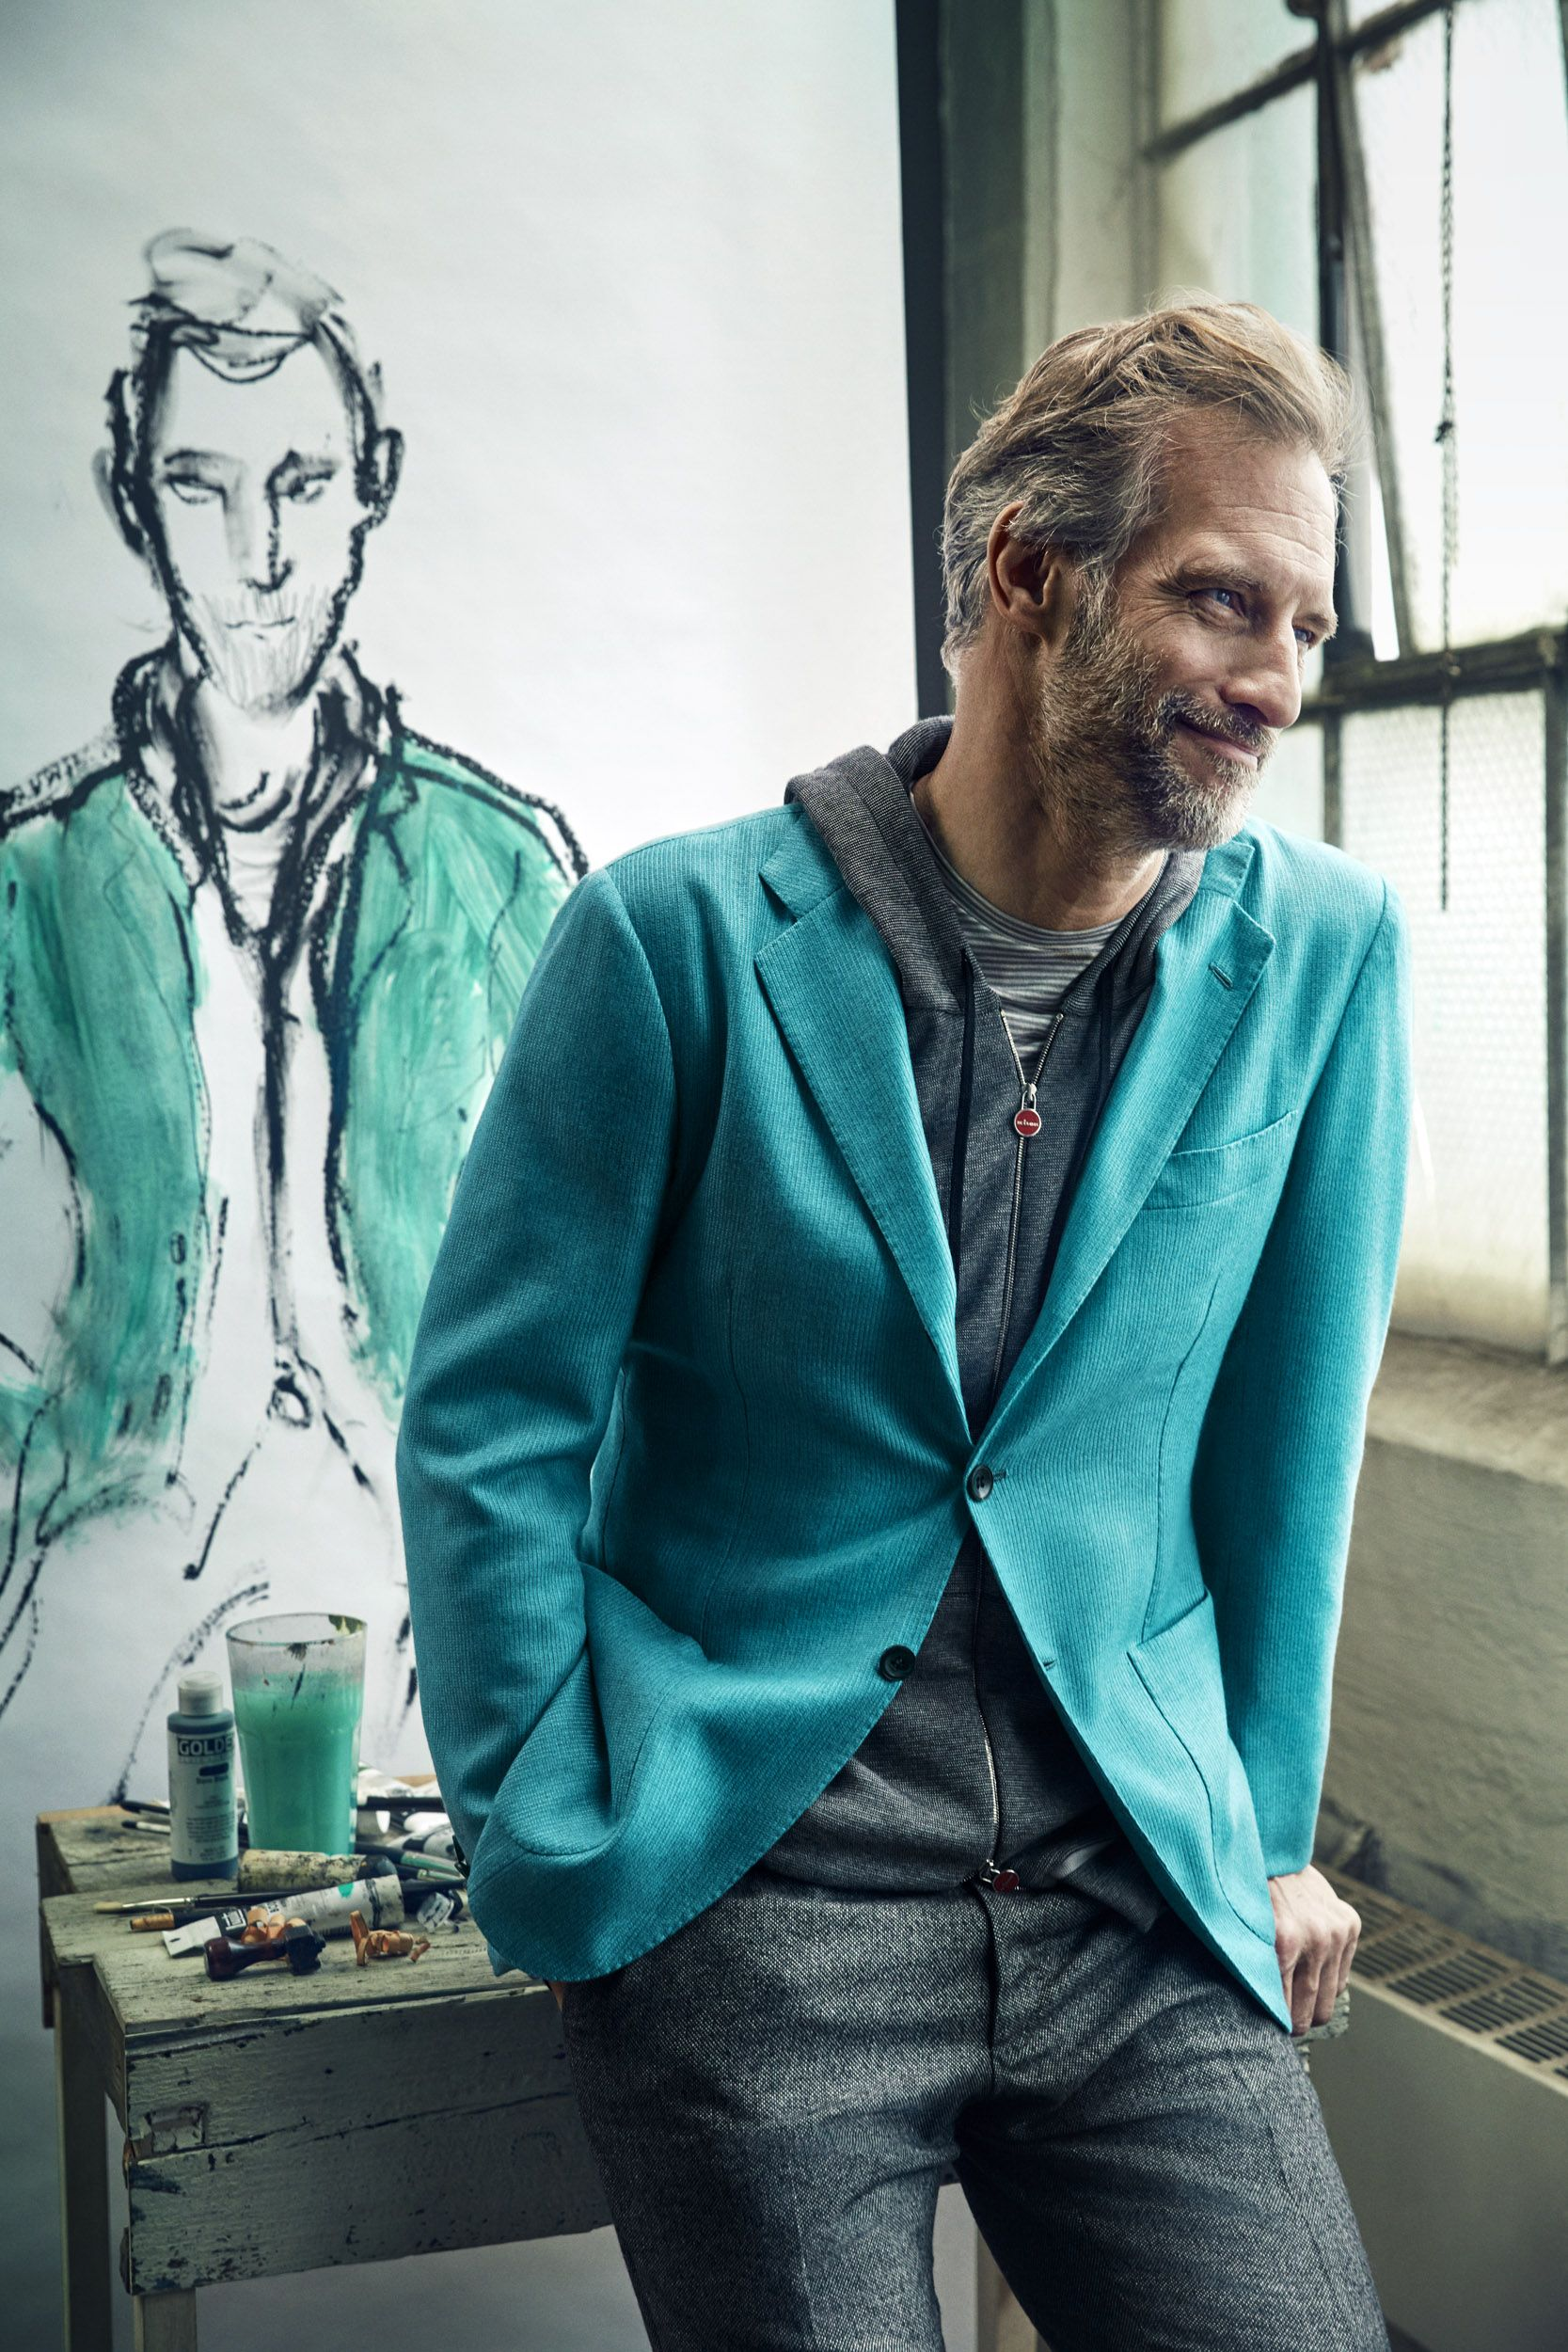 flirting moves that work for men images men fashion clothing